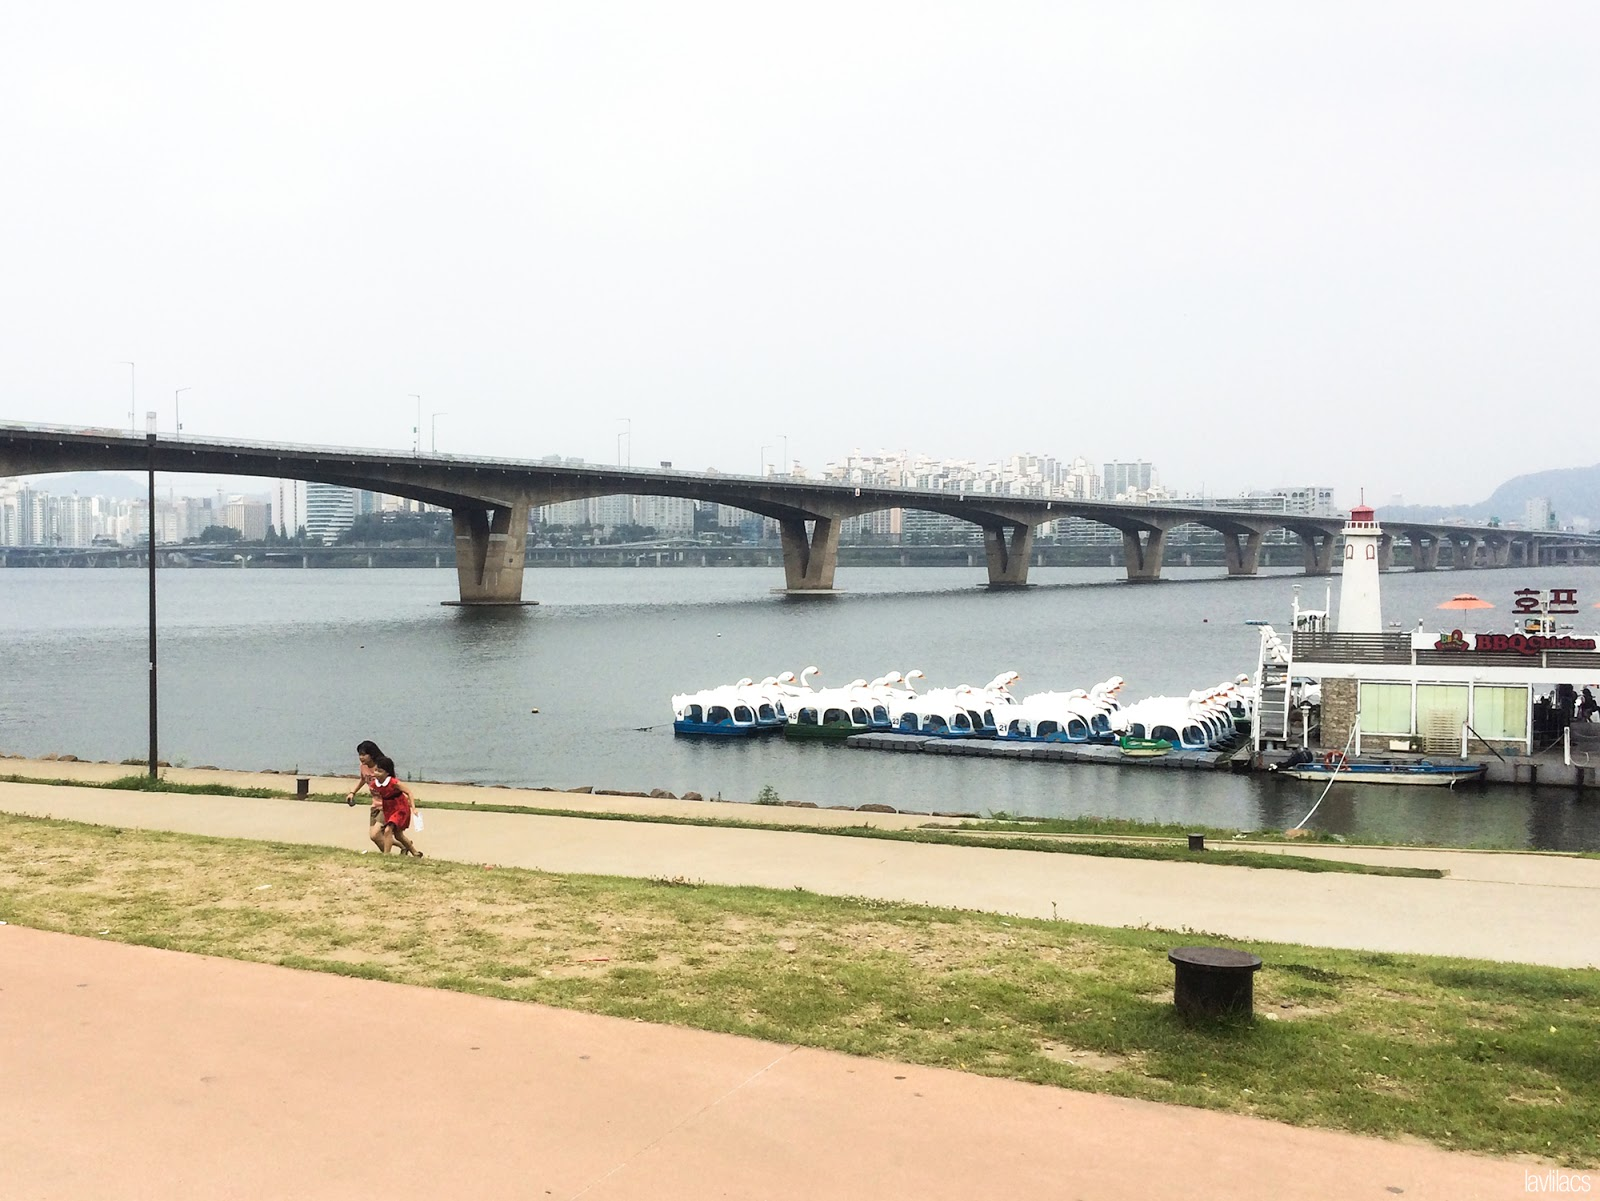 Seoul, Korea - Summer Study Abroad 2014 - Yeouido Park - Han River - swan pedal boat area